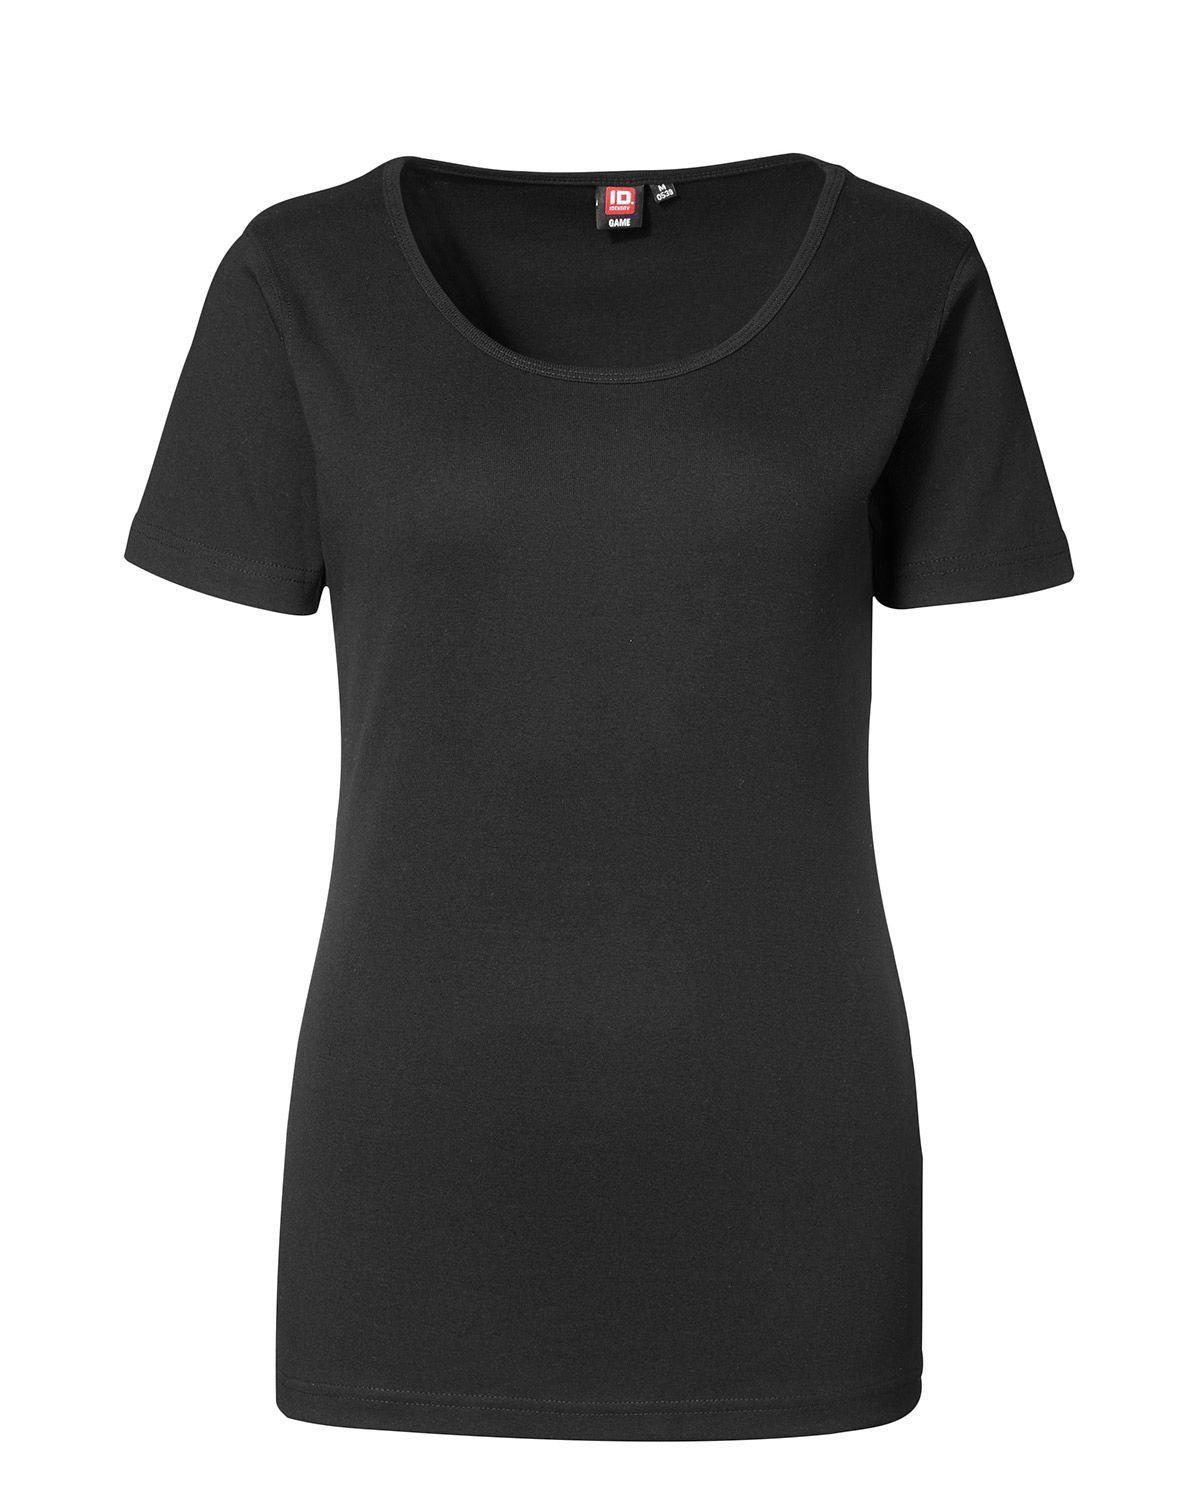 ID 1x1 rib T-shirt til Kvinder (Sort, 2XL)